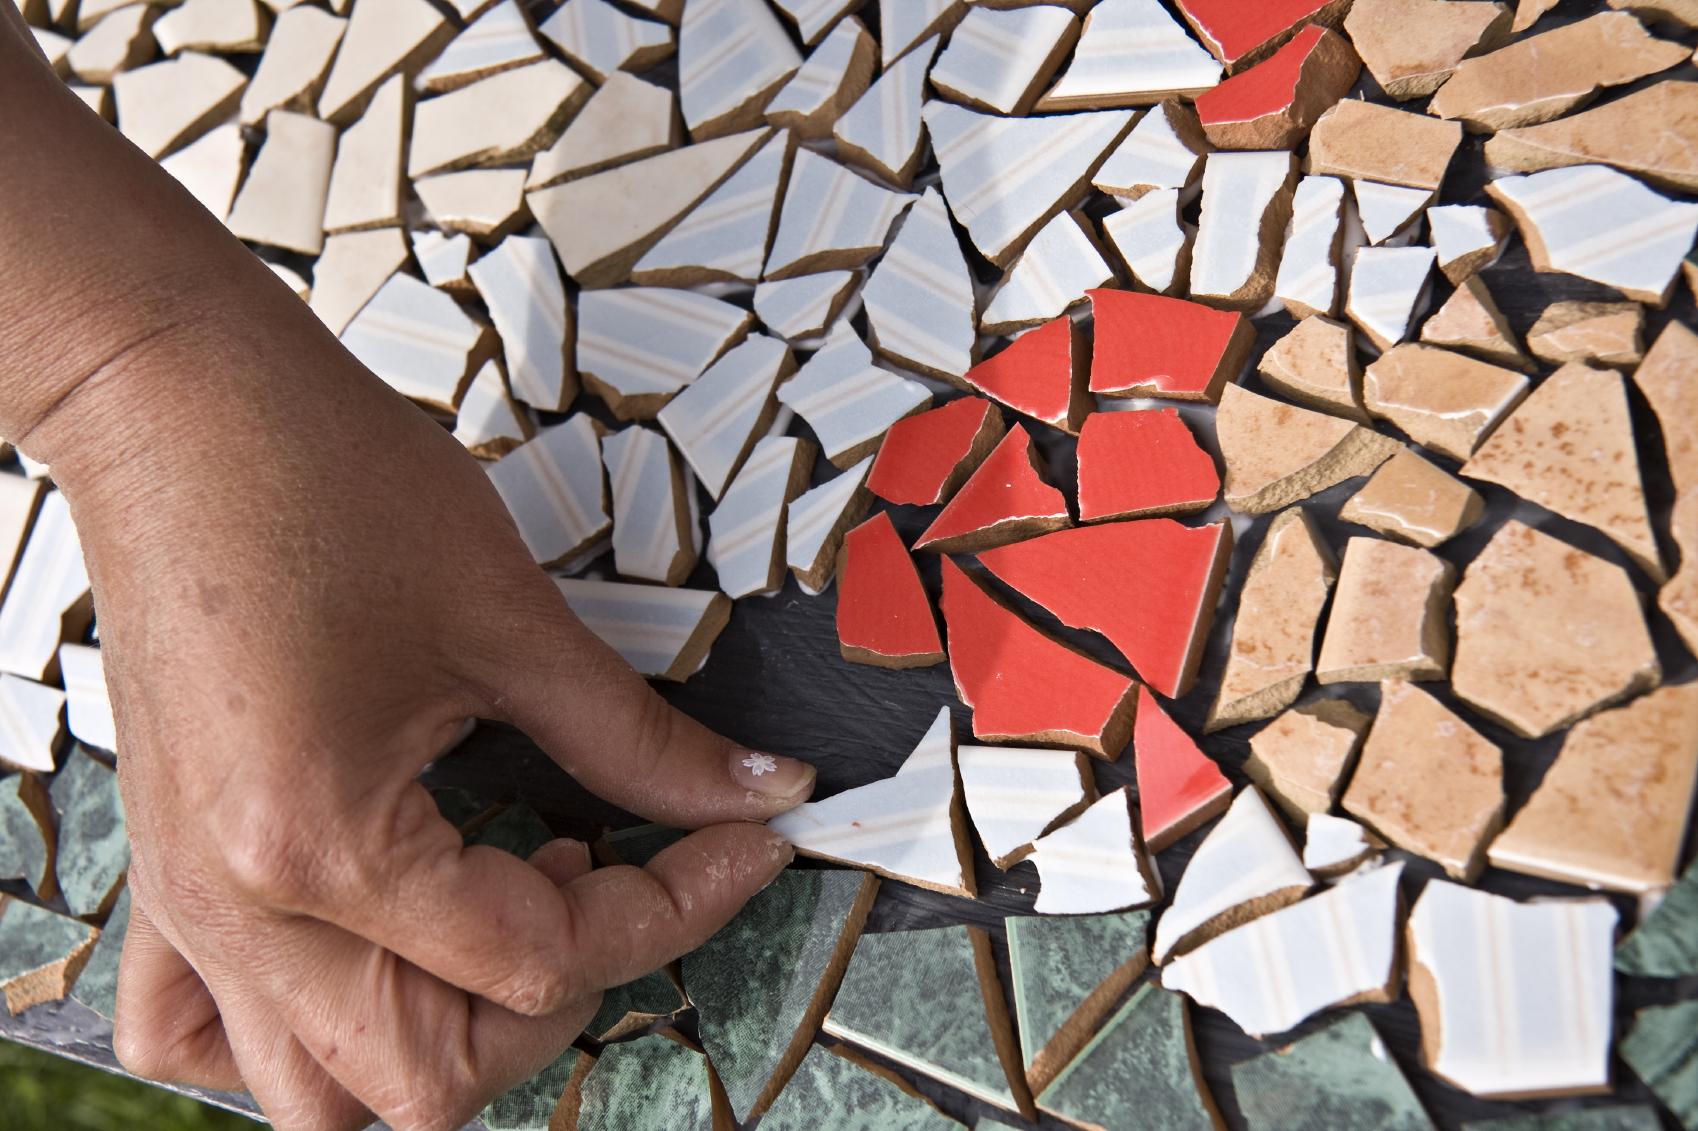 mosaic-pieces.jpg